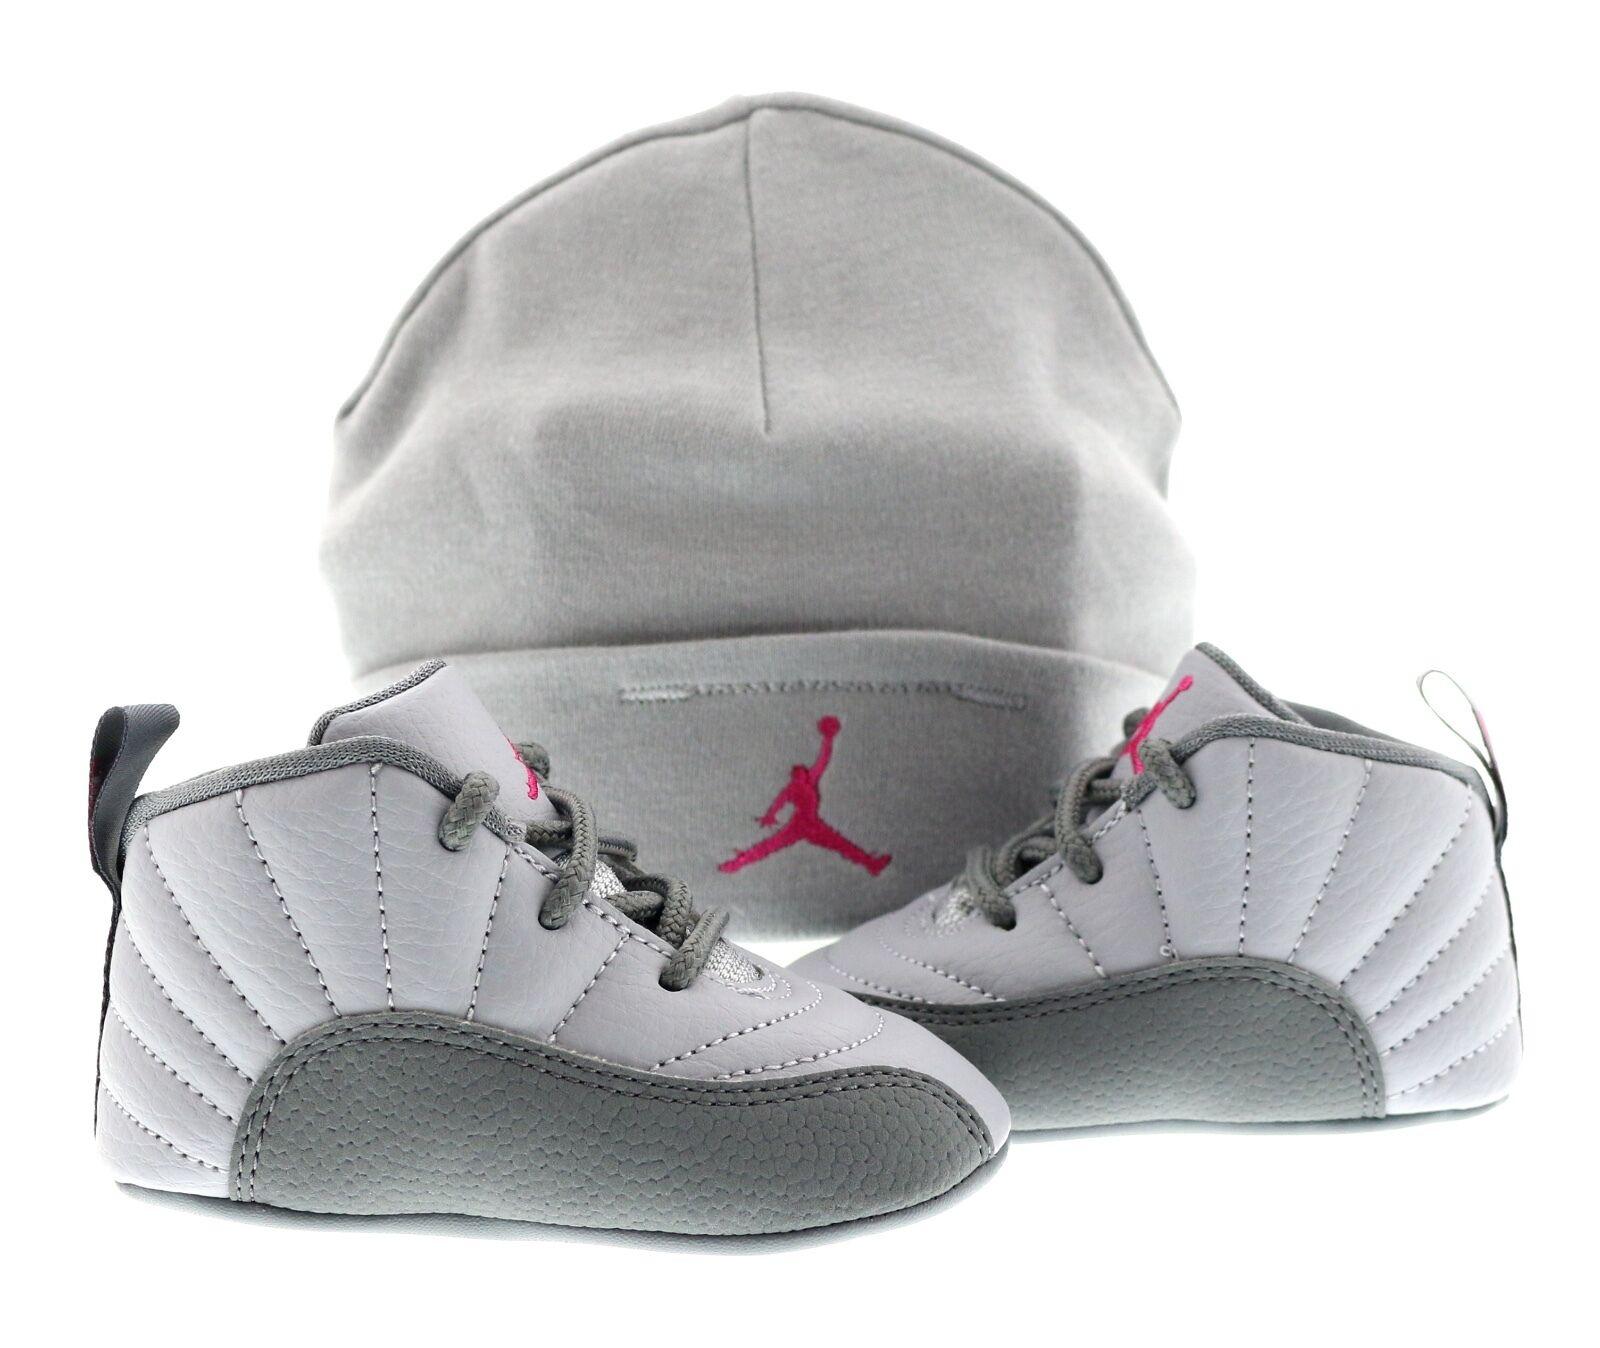 Baby Soft Bottom GP Jordan 12 Retro Grey Pink 029